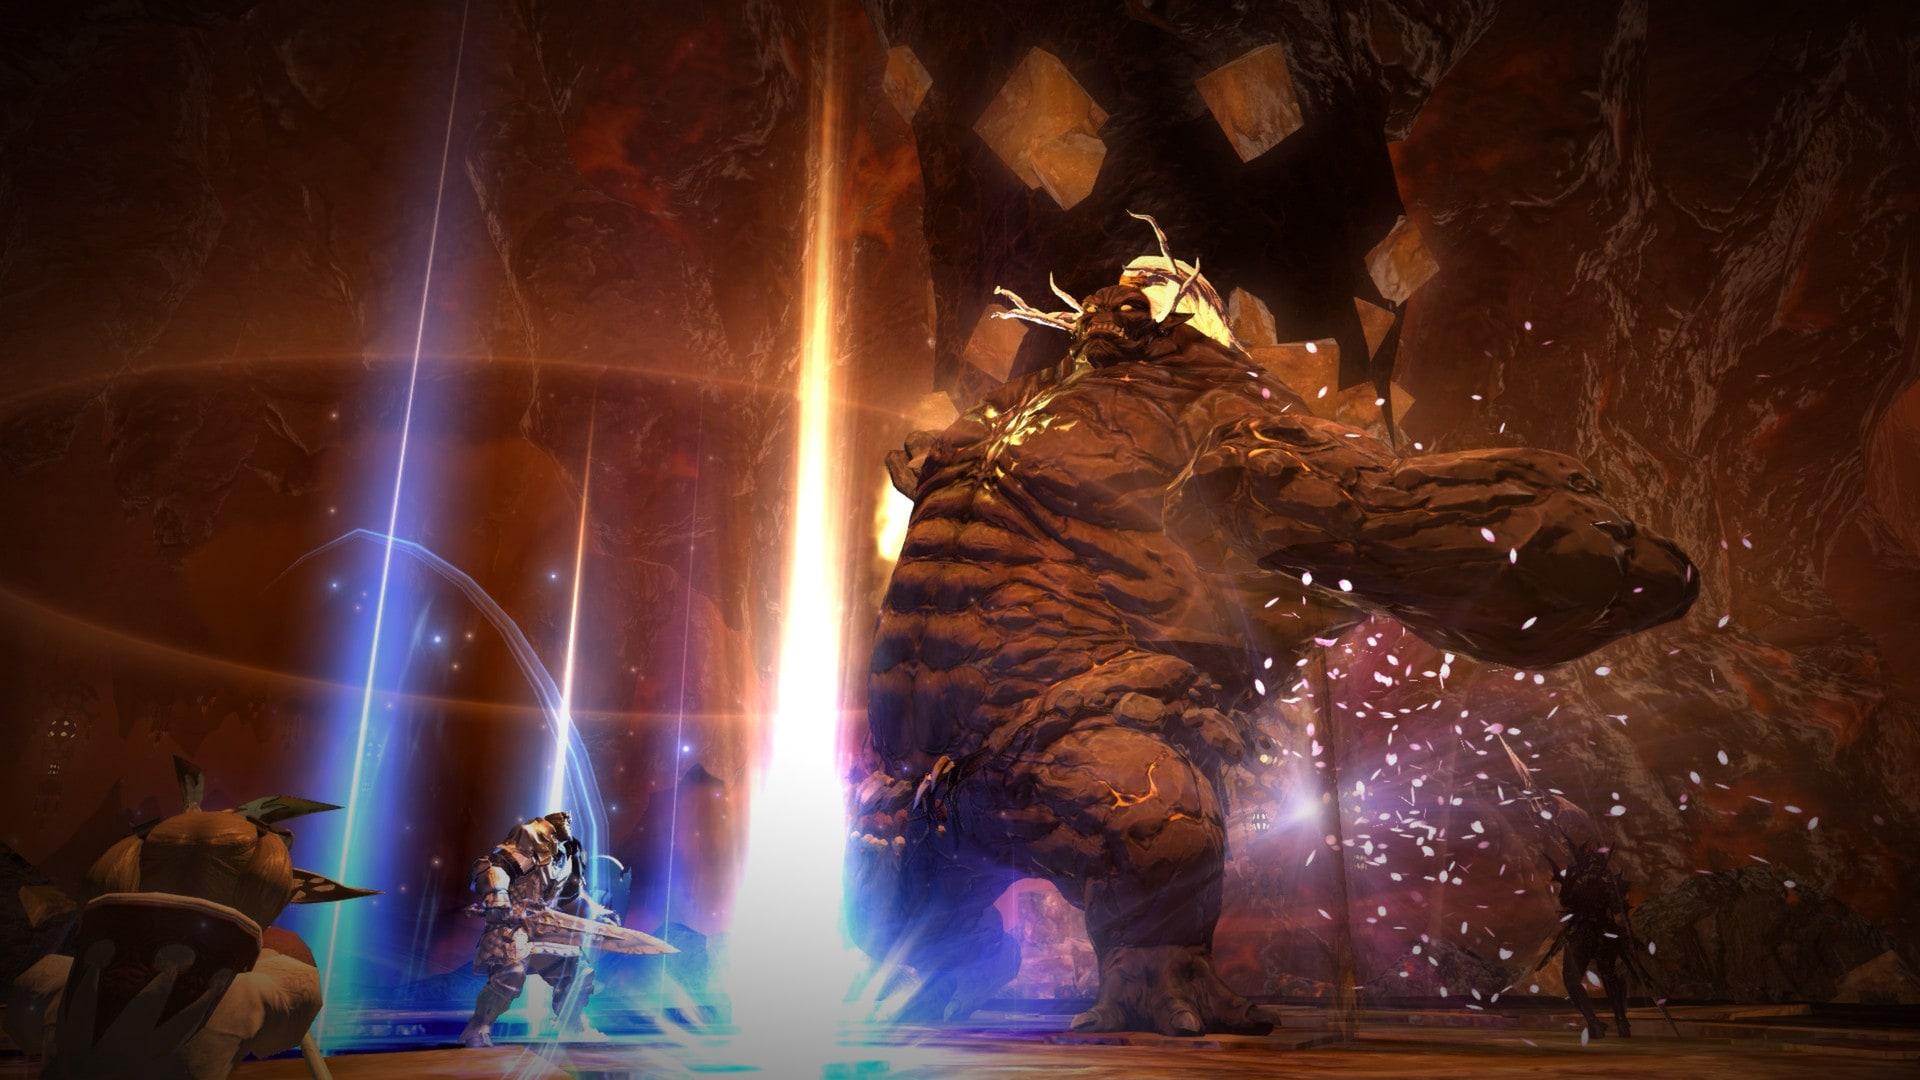 FINAL FANTASY XIV ONLINE COMPLETE EDITION Final Fantasy Key EUROPE - 2